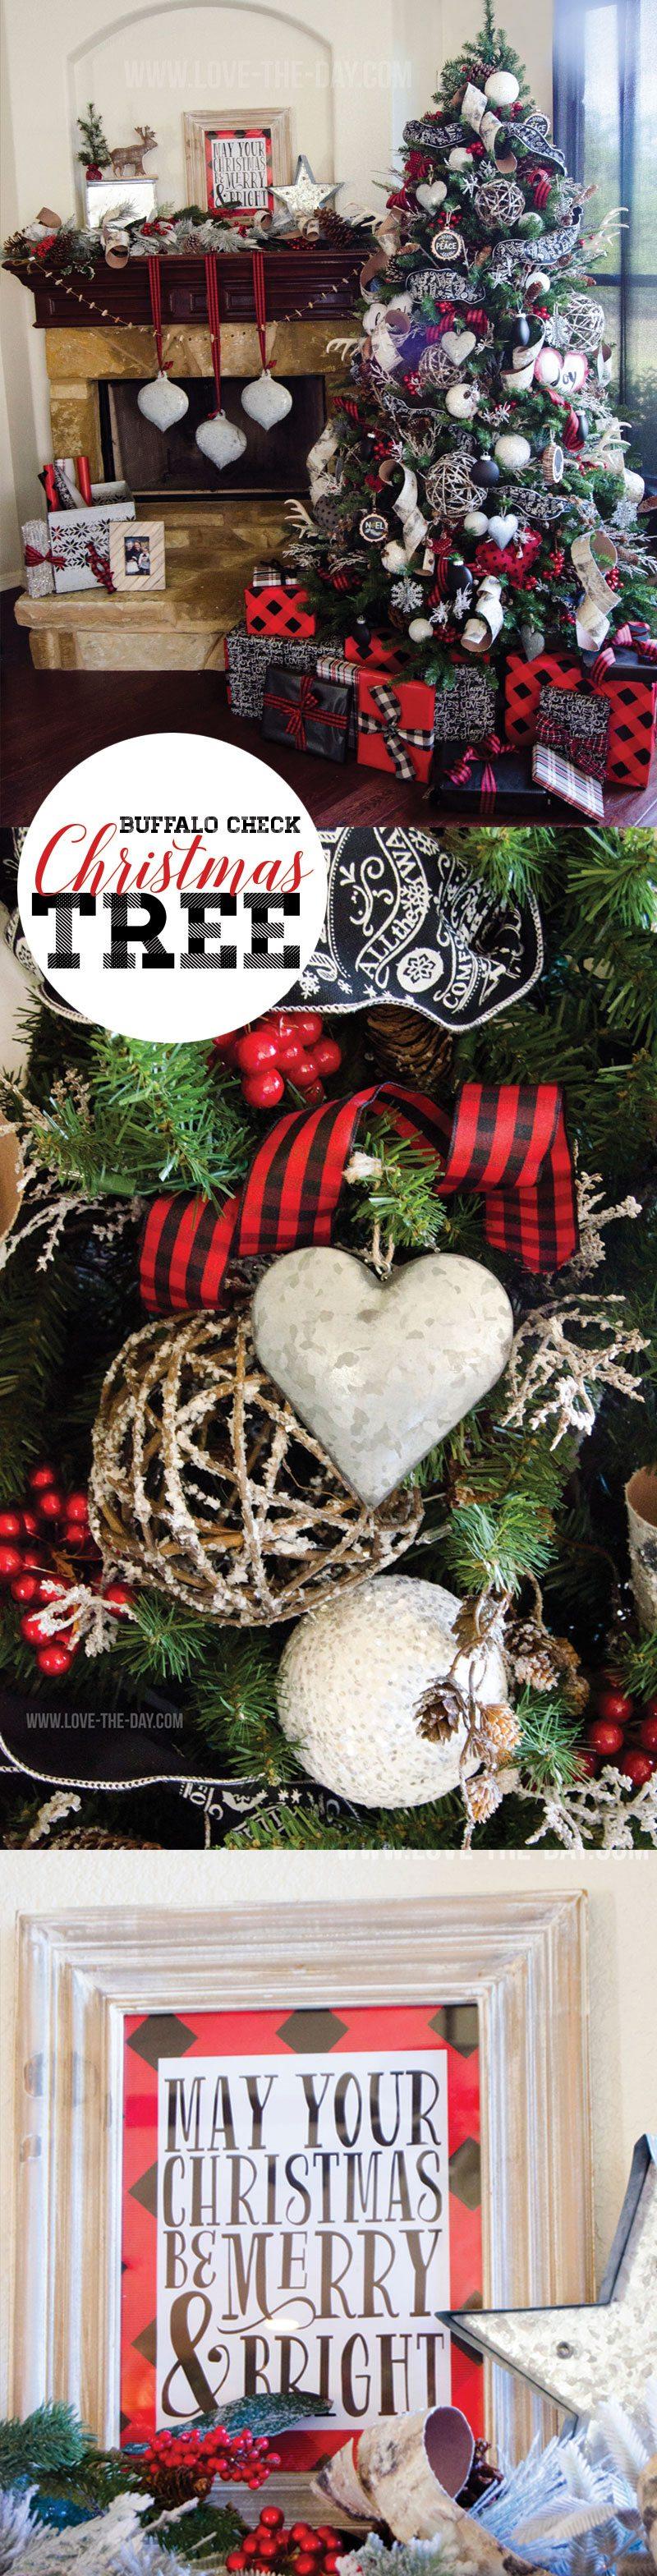 Buffalo Check Christmas Tree Idea by Lindi Haws of Love The Day